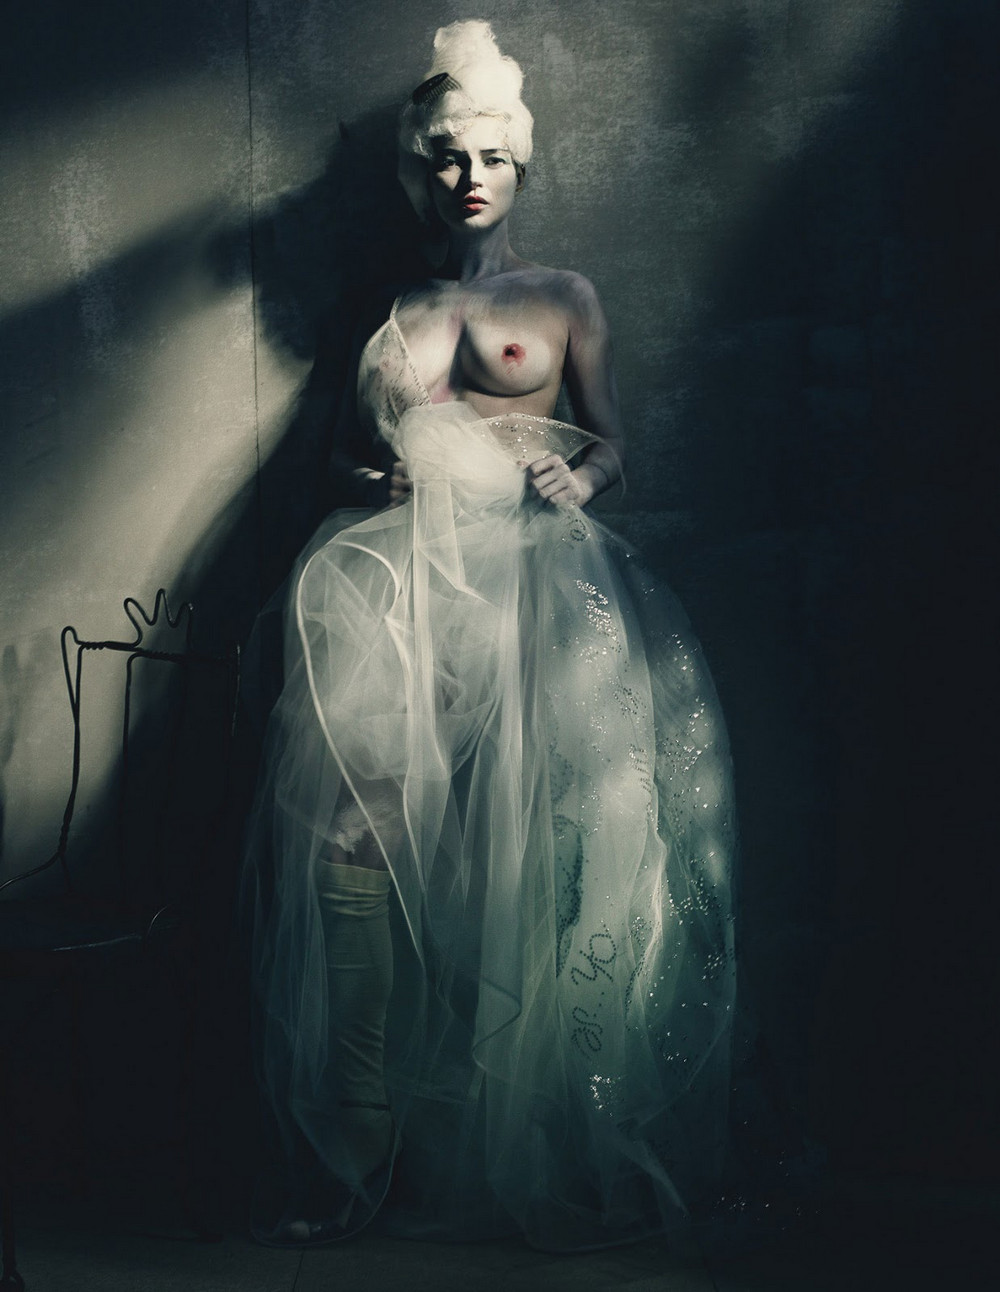 Снимки итальянского фэшн-фотографа Паоло Роверси